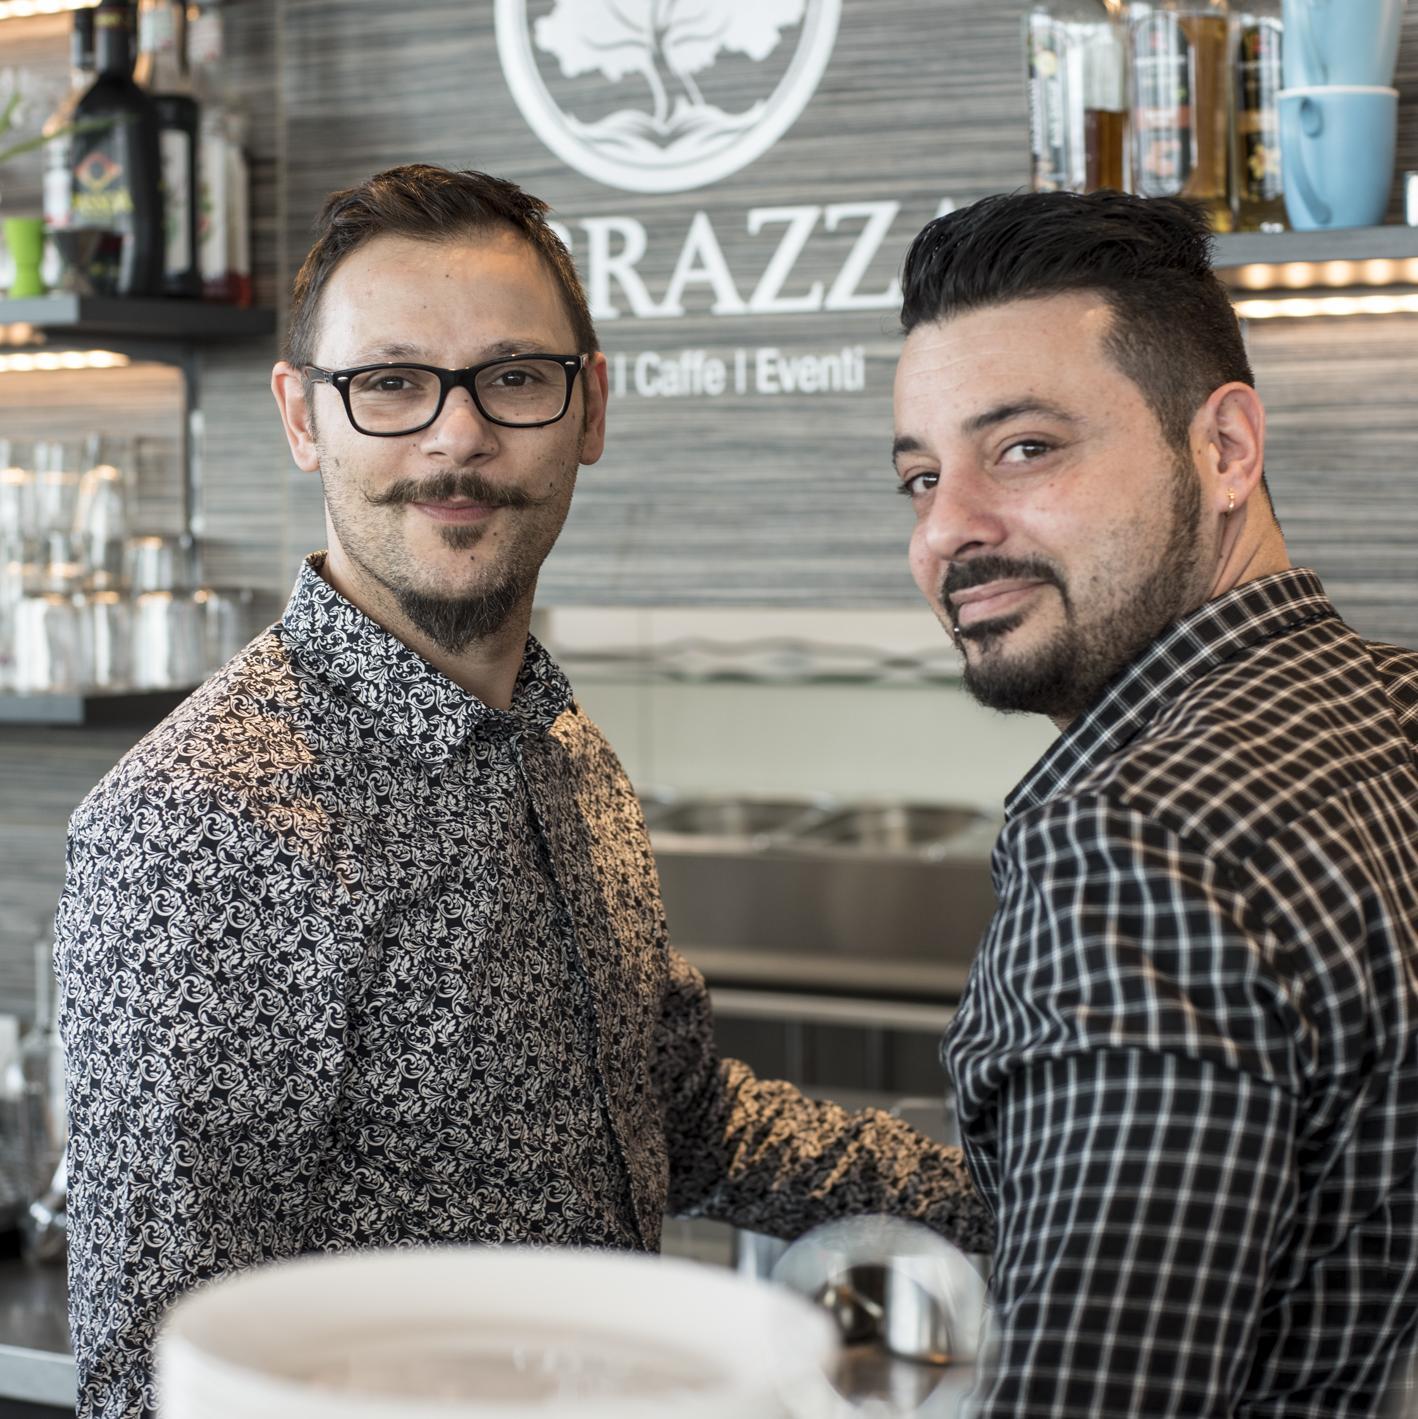 Fürthfaktor Terrazza Café